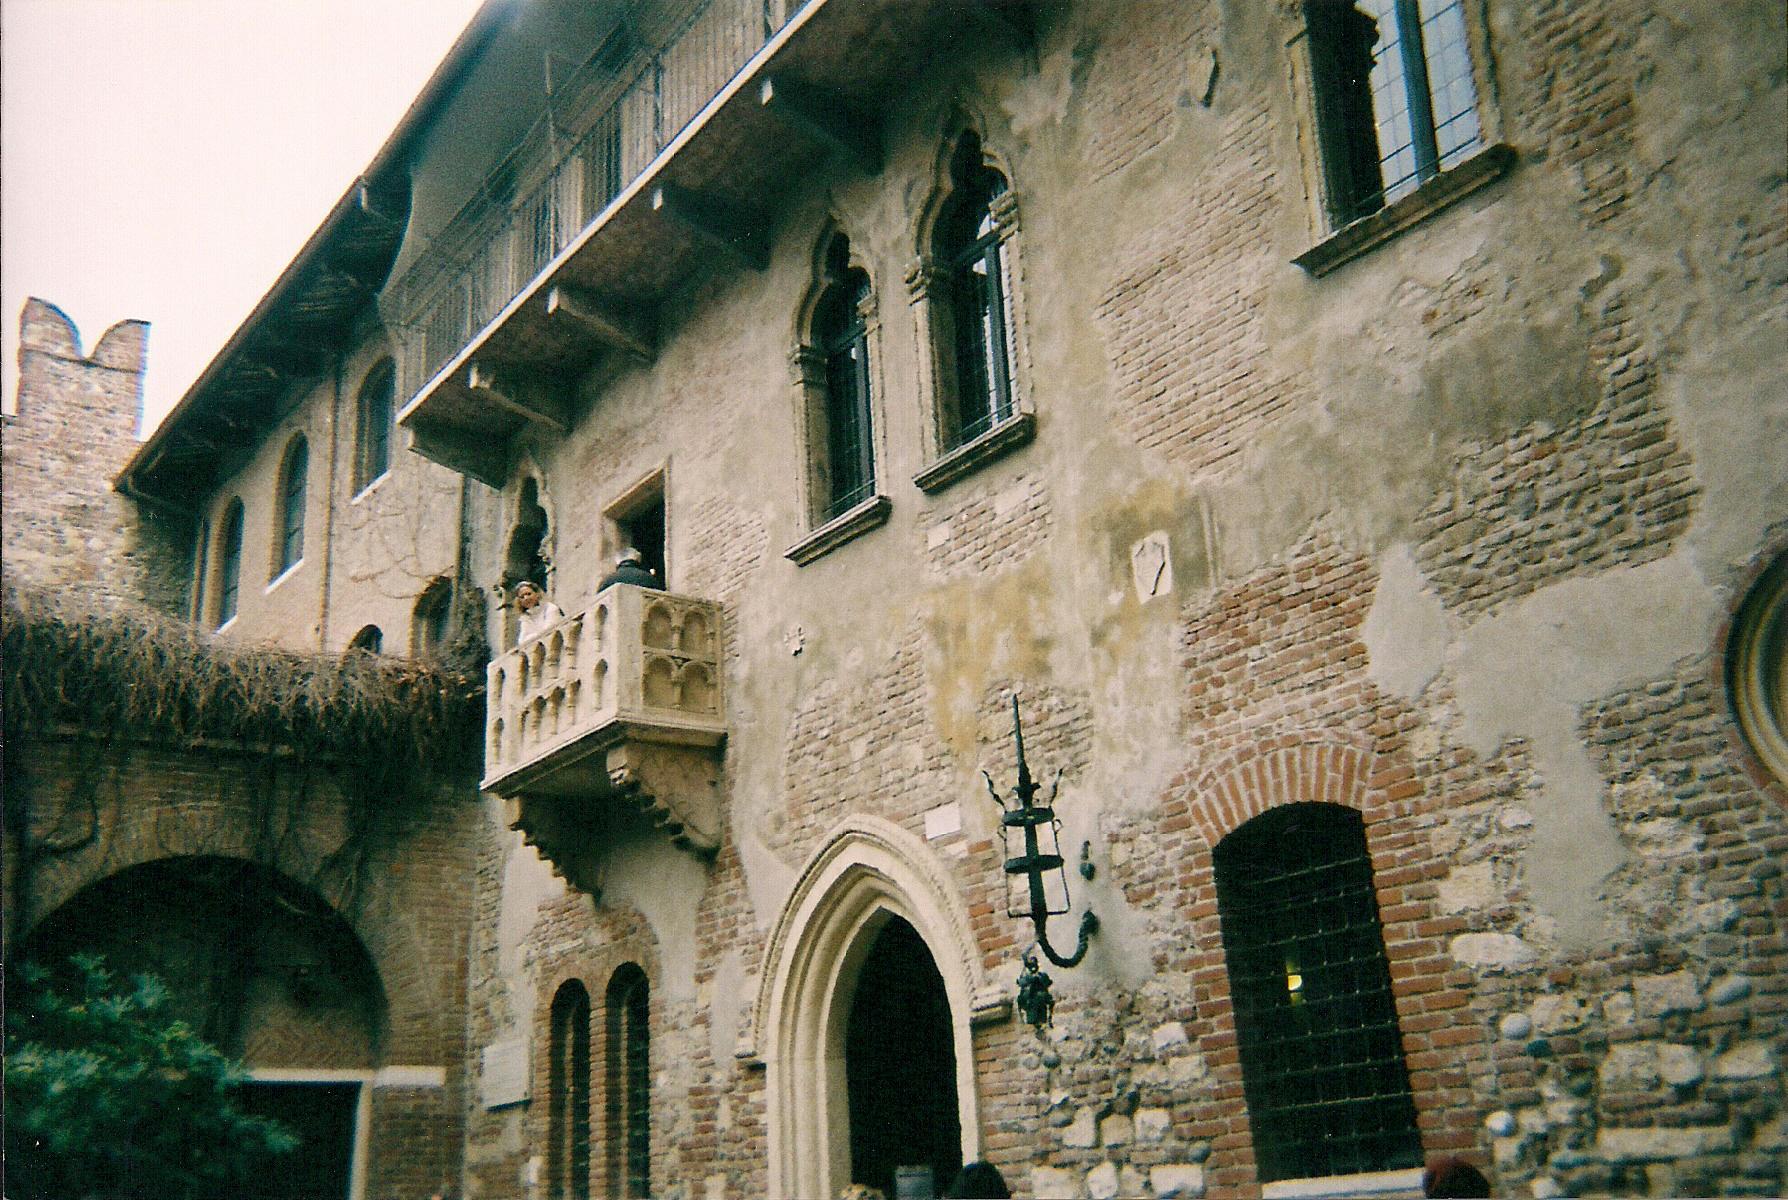 Juliet's balcony, Casa di Giulietta, Verona, Italy.